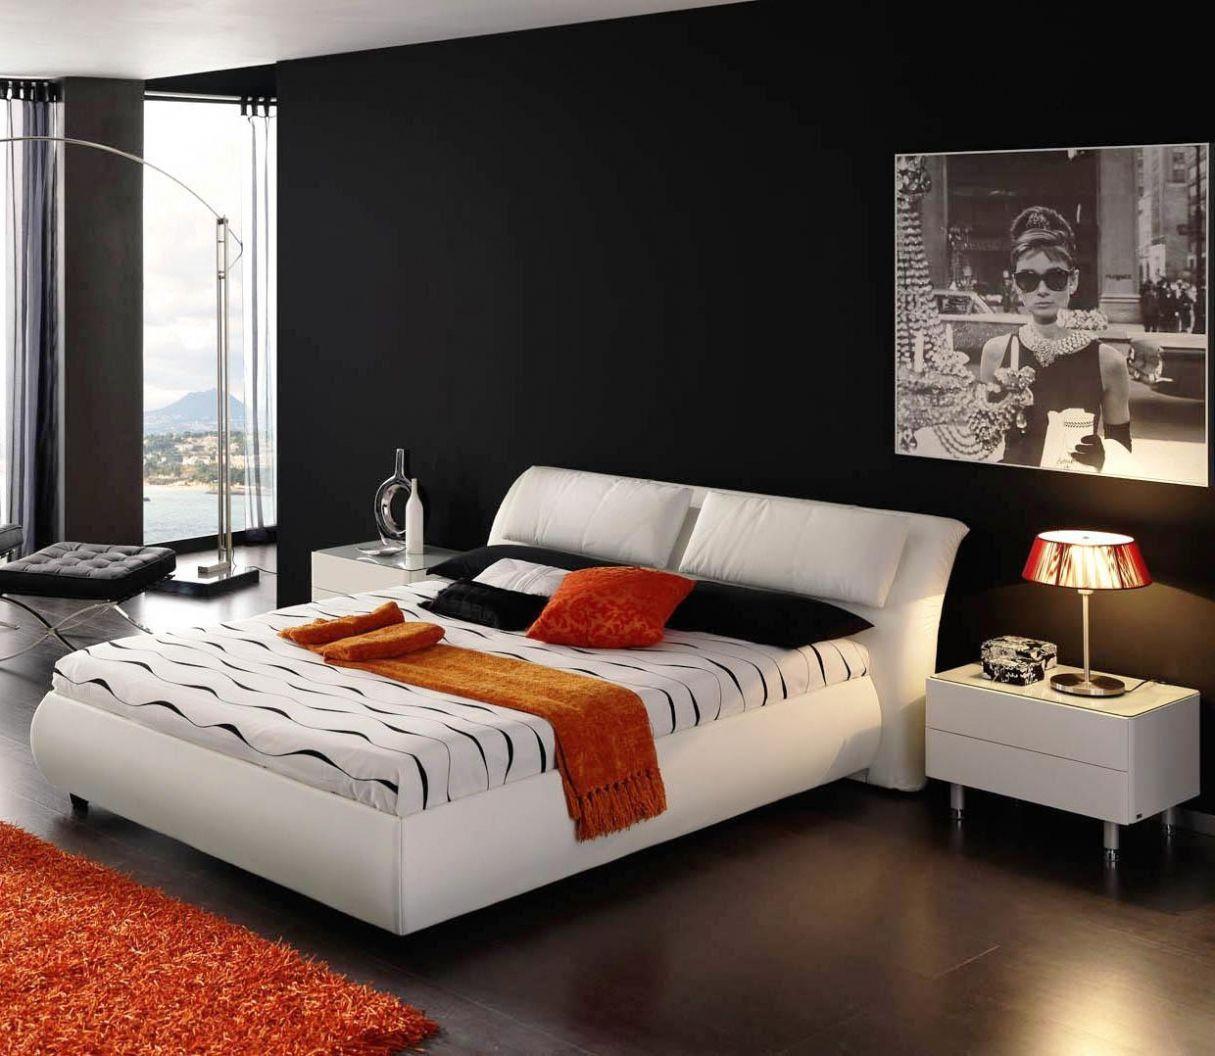 Bedroomdesignsminimalistmoderncoolbedroomcolorideasmenin